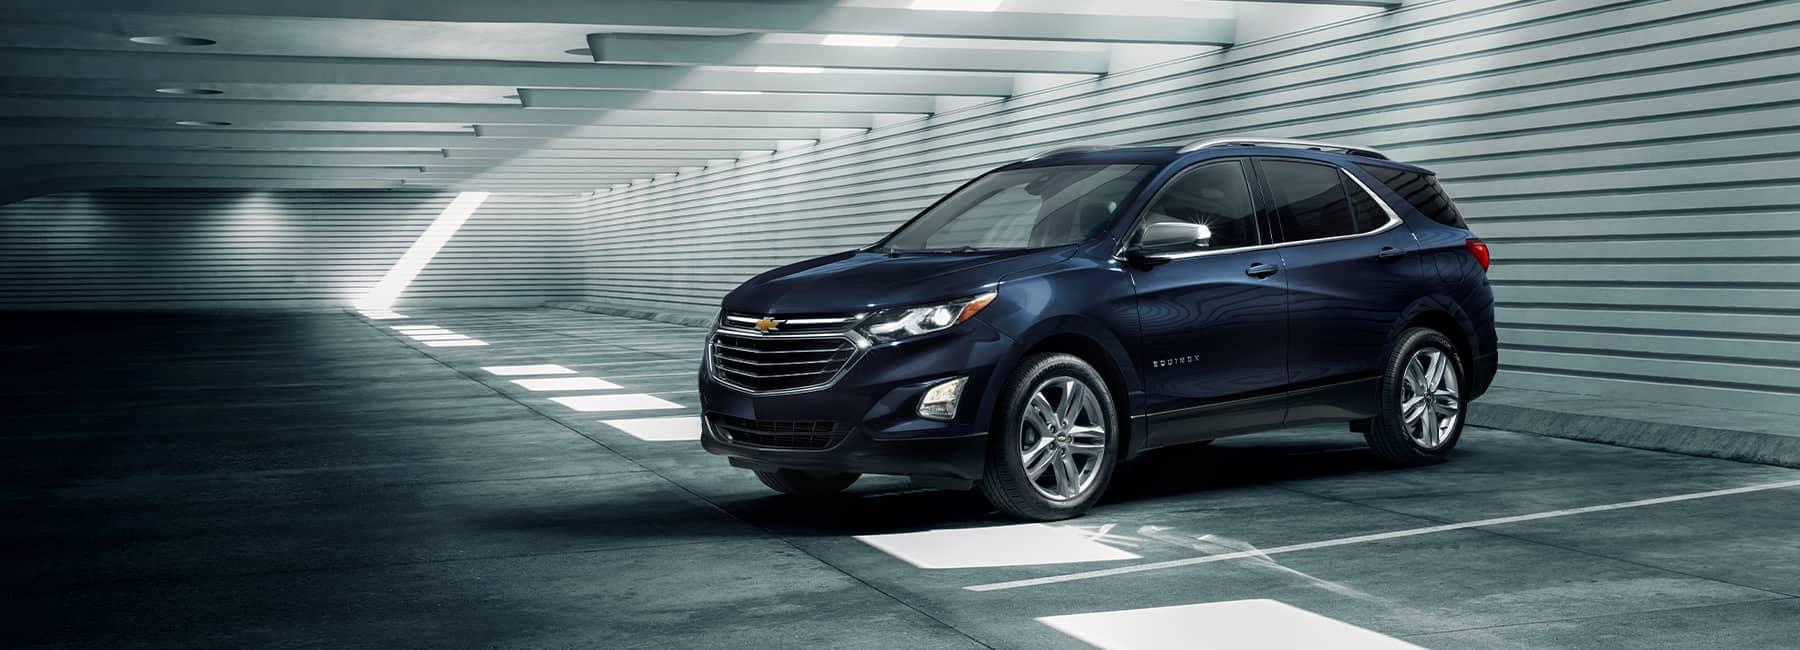 A blue 2021 Chevrolet Equinox parked inside a parking garage